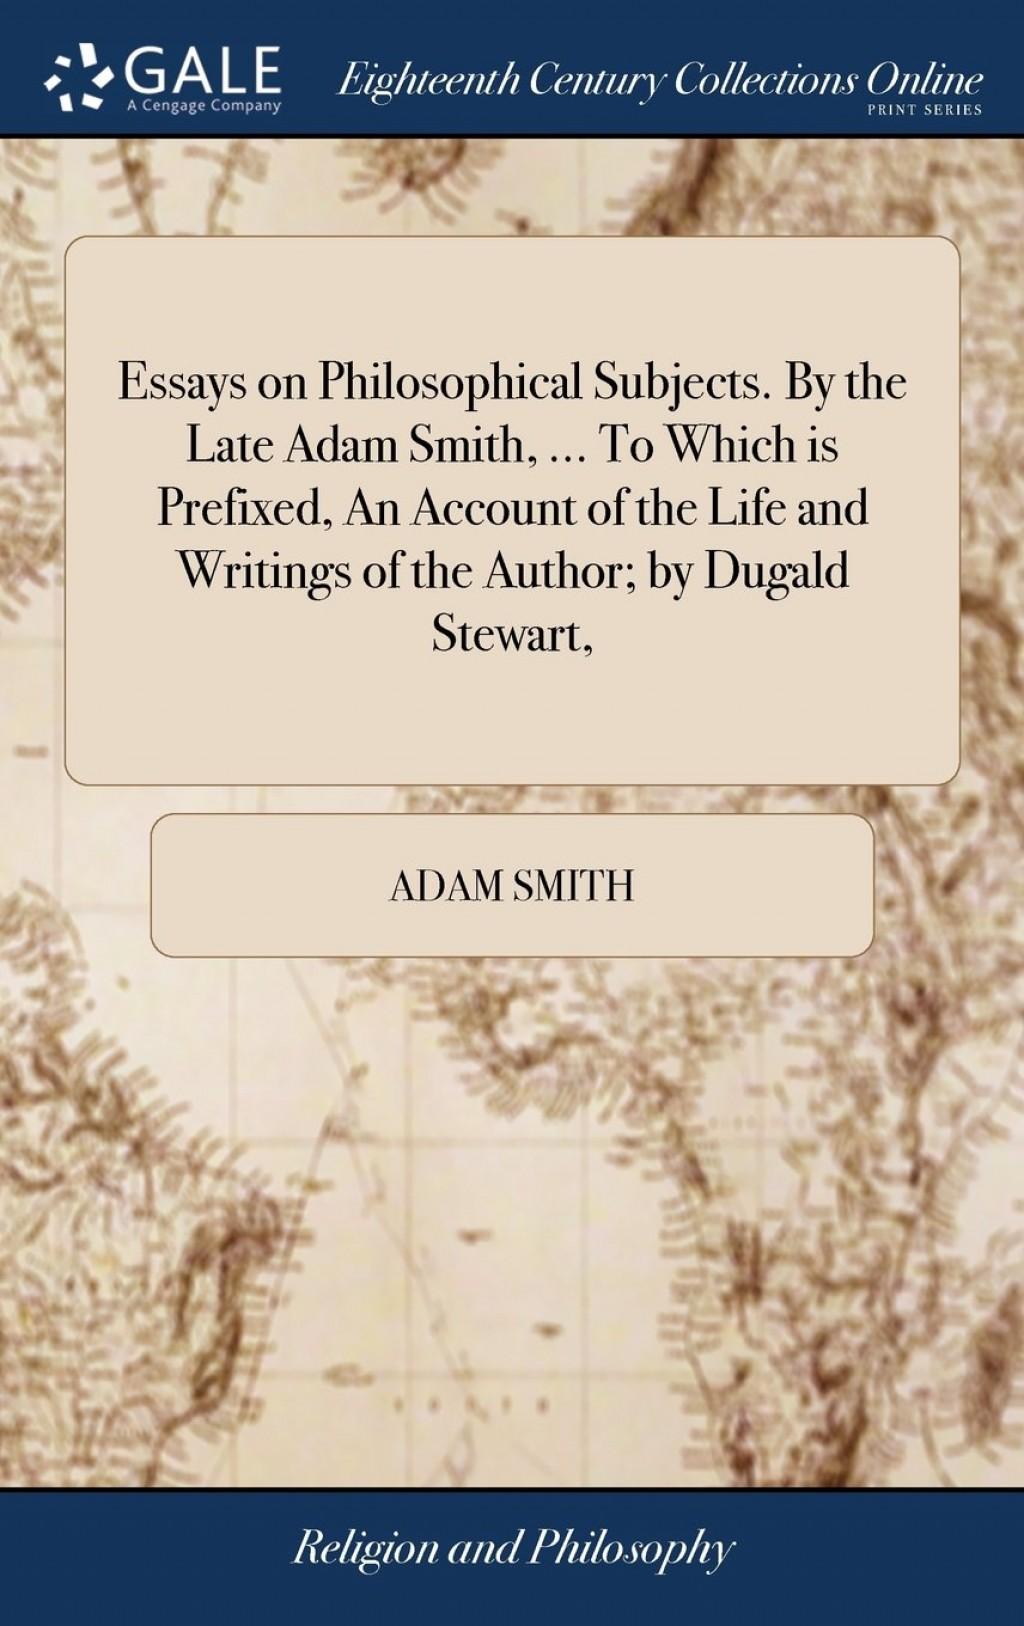 003 710kw3nycfl Essays On Philosophical Subjects Essay Best Smith Pdf Large